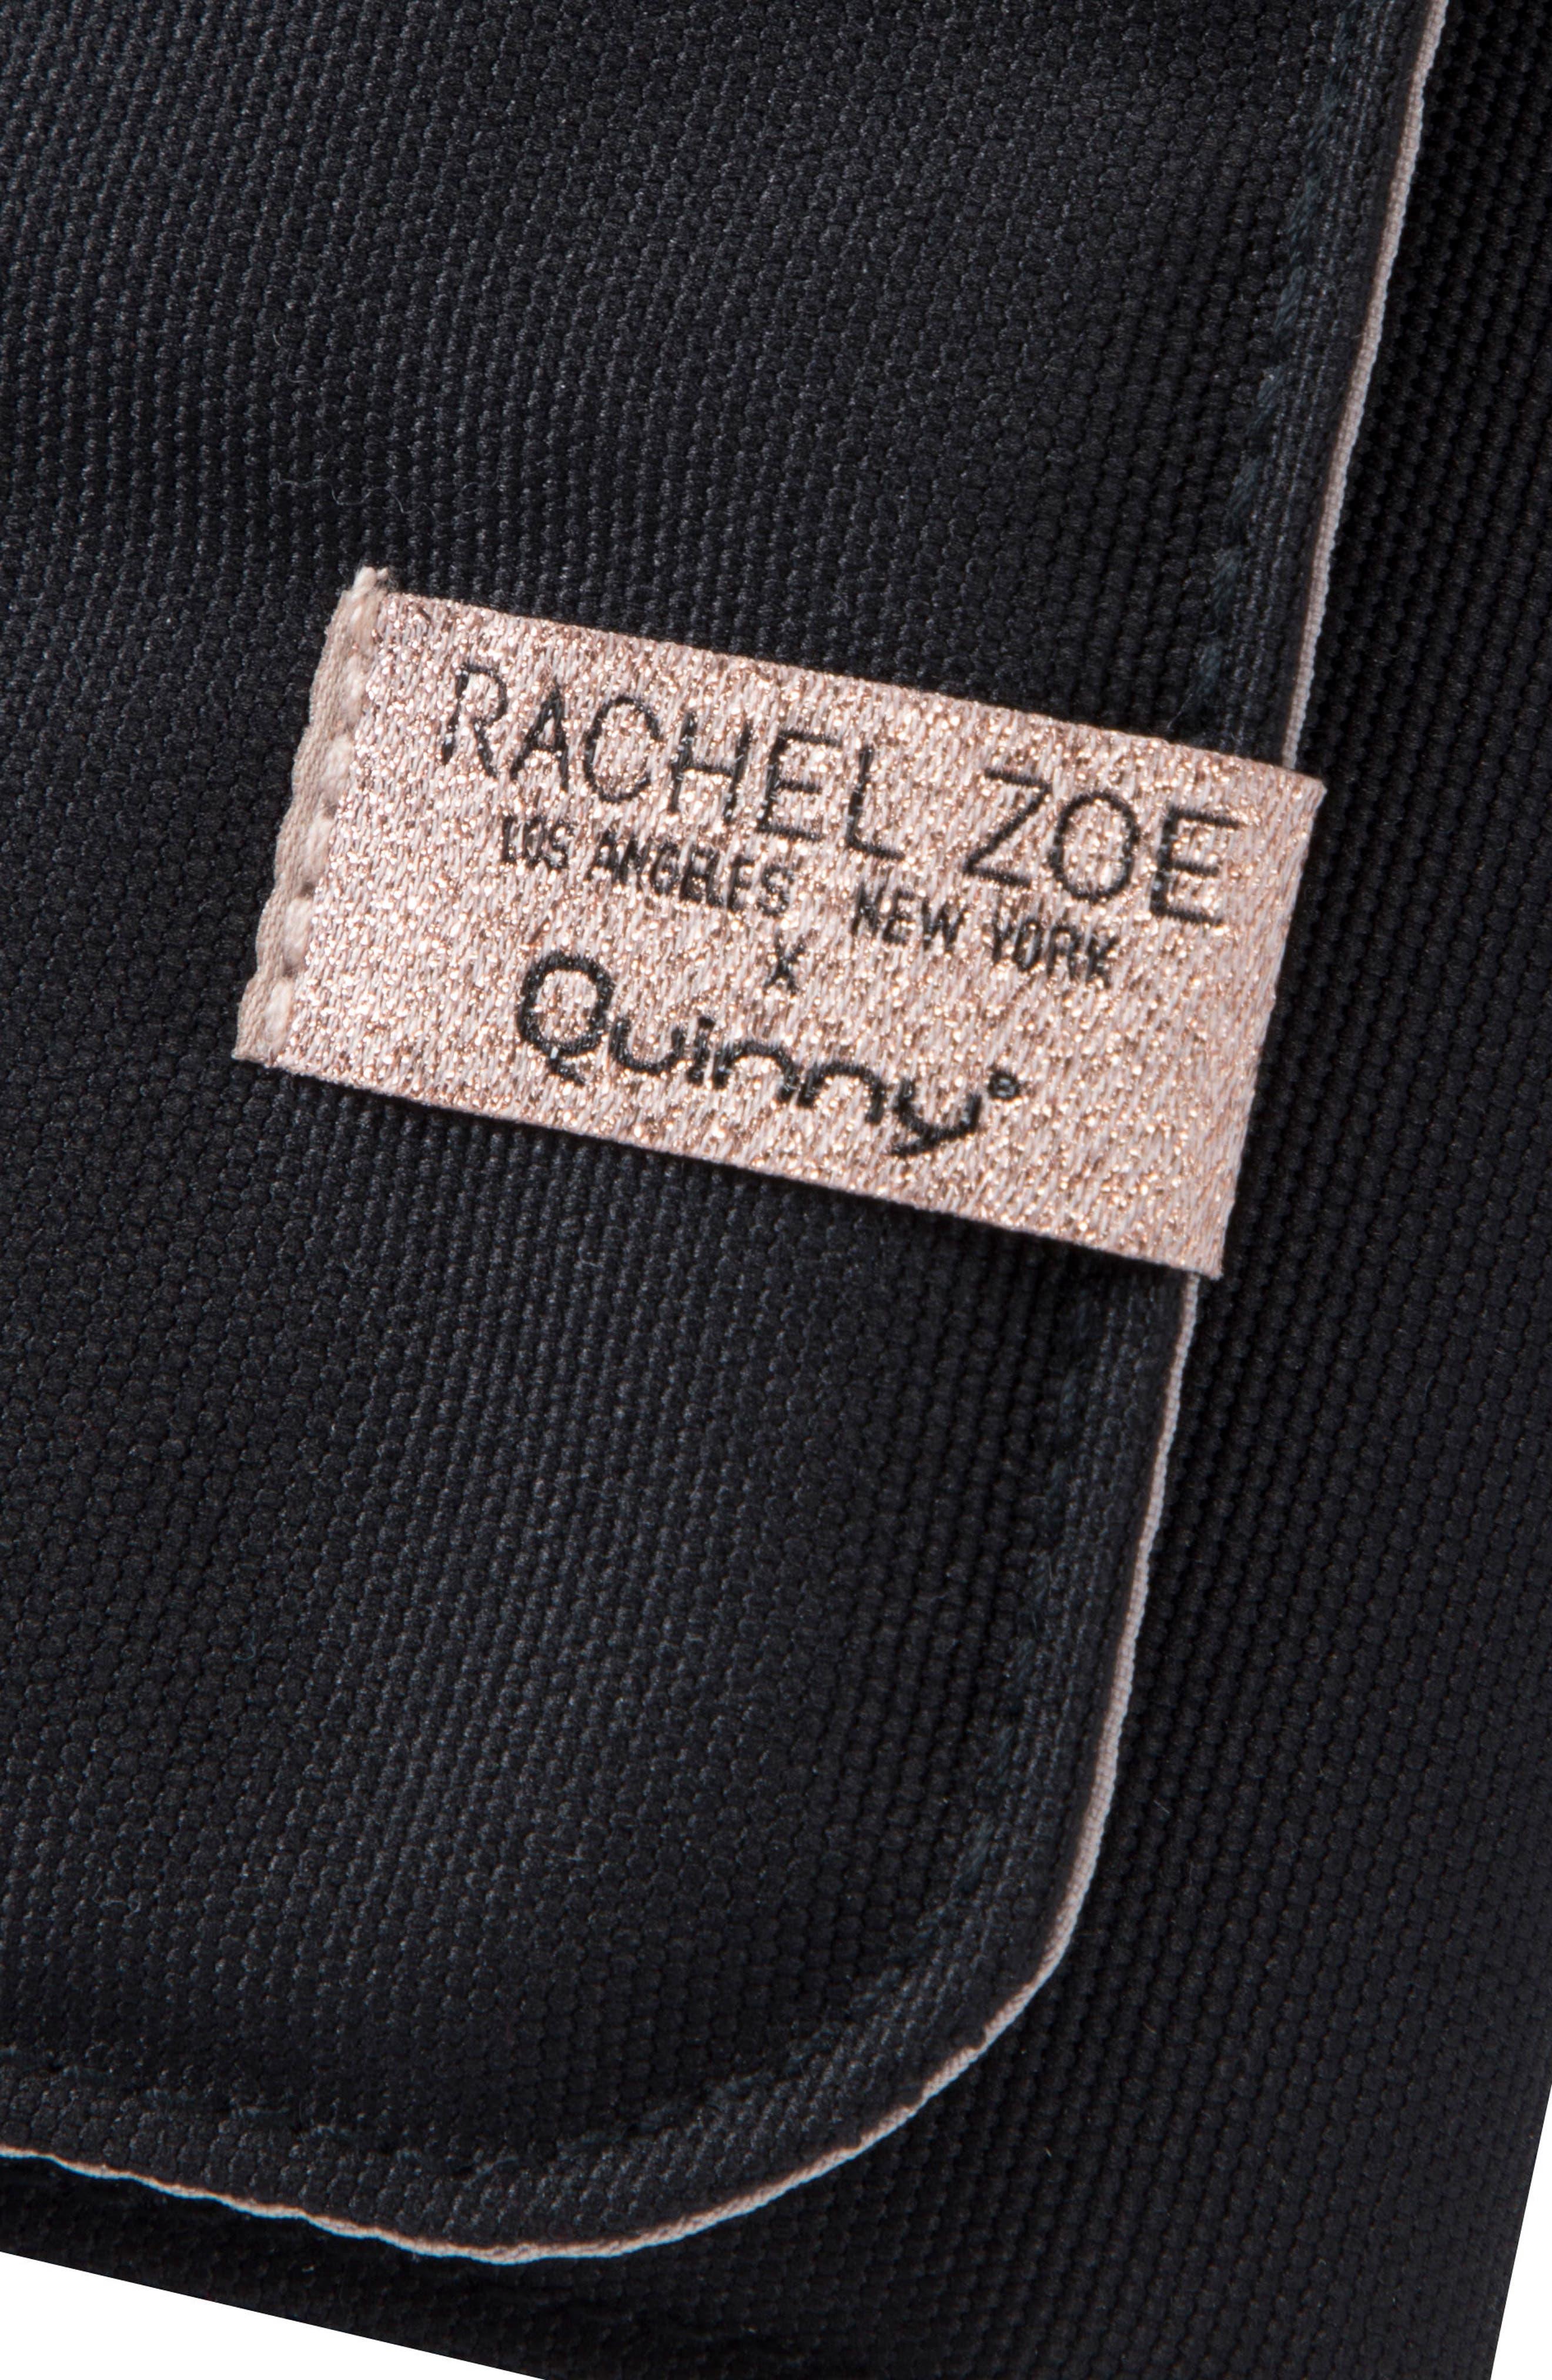 x Rachel Zoe Luxe Sport Diaper Bag,                             Alternate thumbnail 11, color,                             Rz Luxe Sport